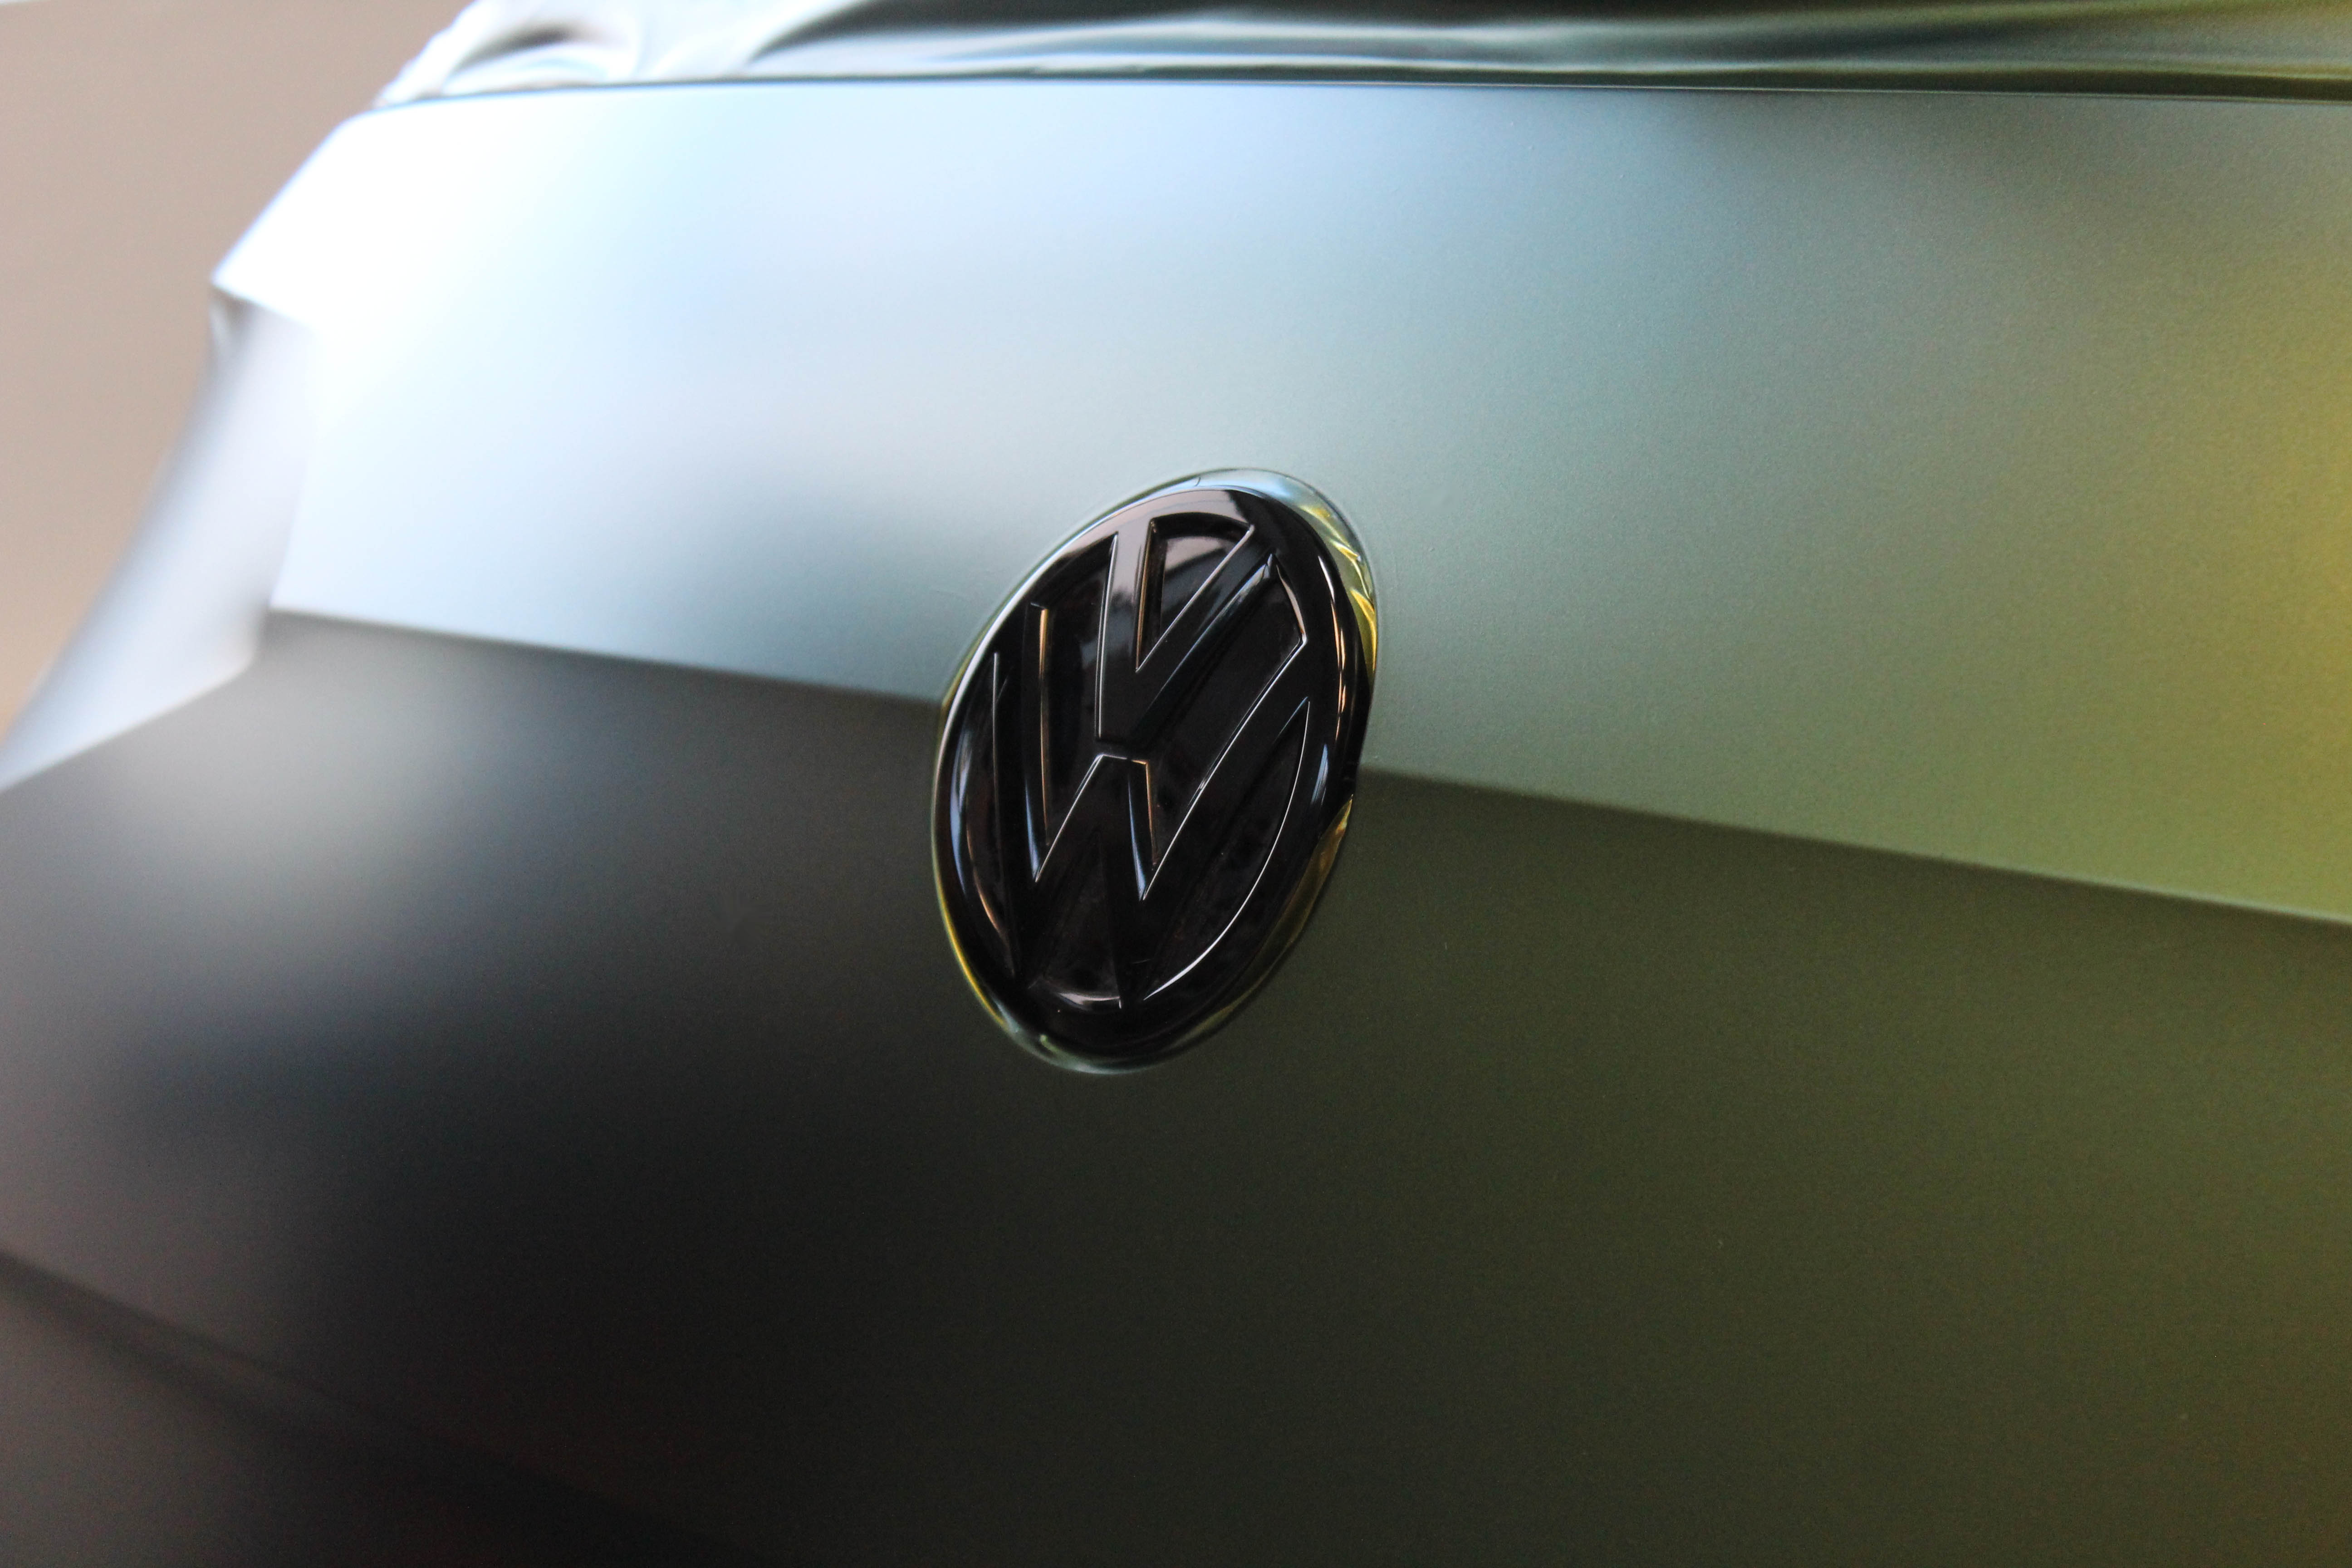 Golf_GTD_design_carwrap_folie_flip_flop_17